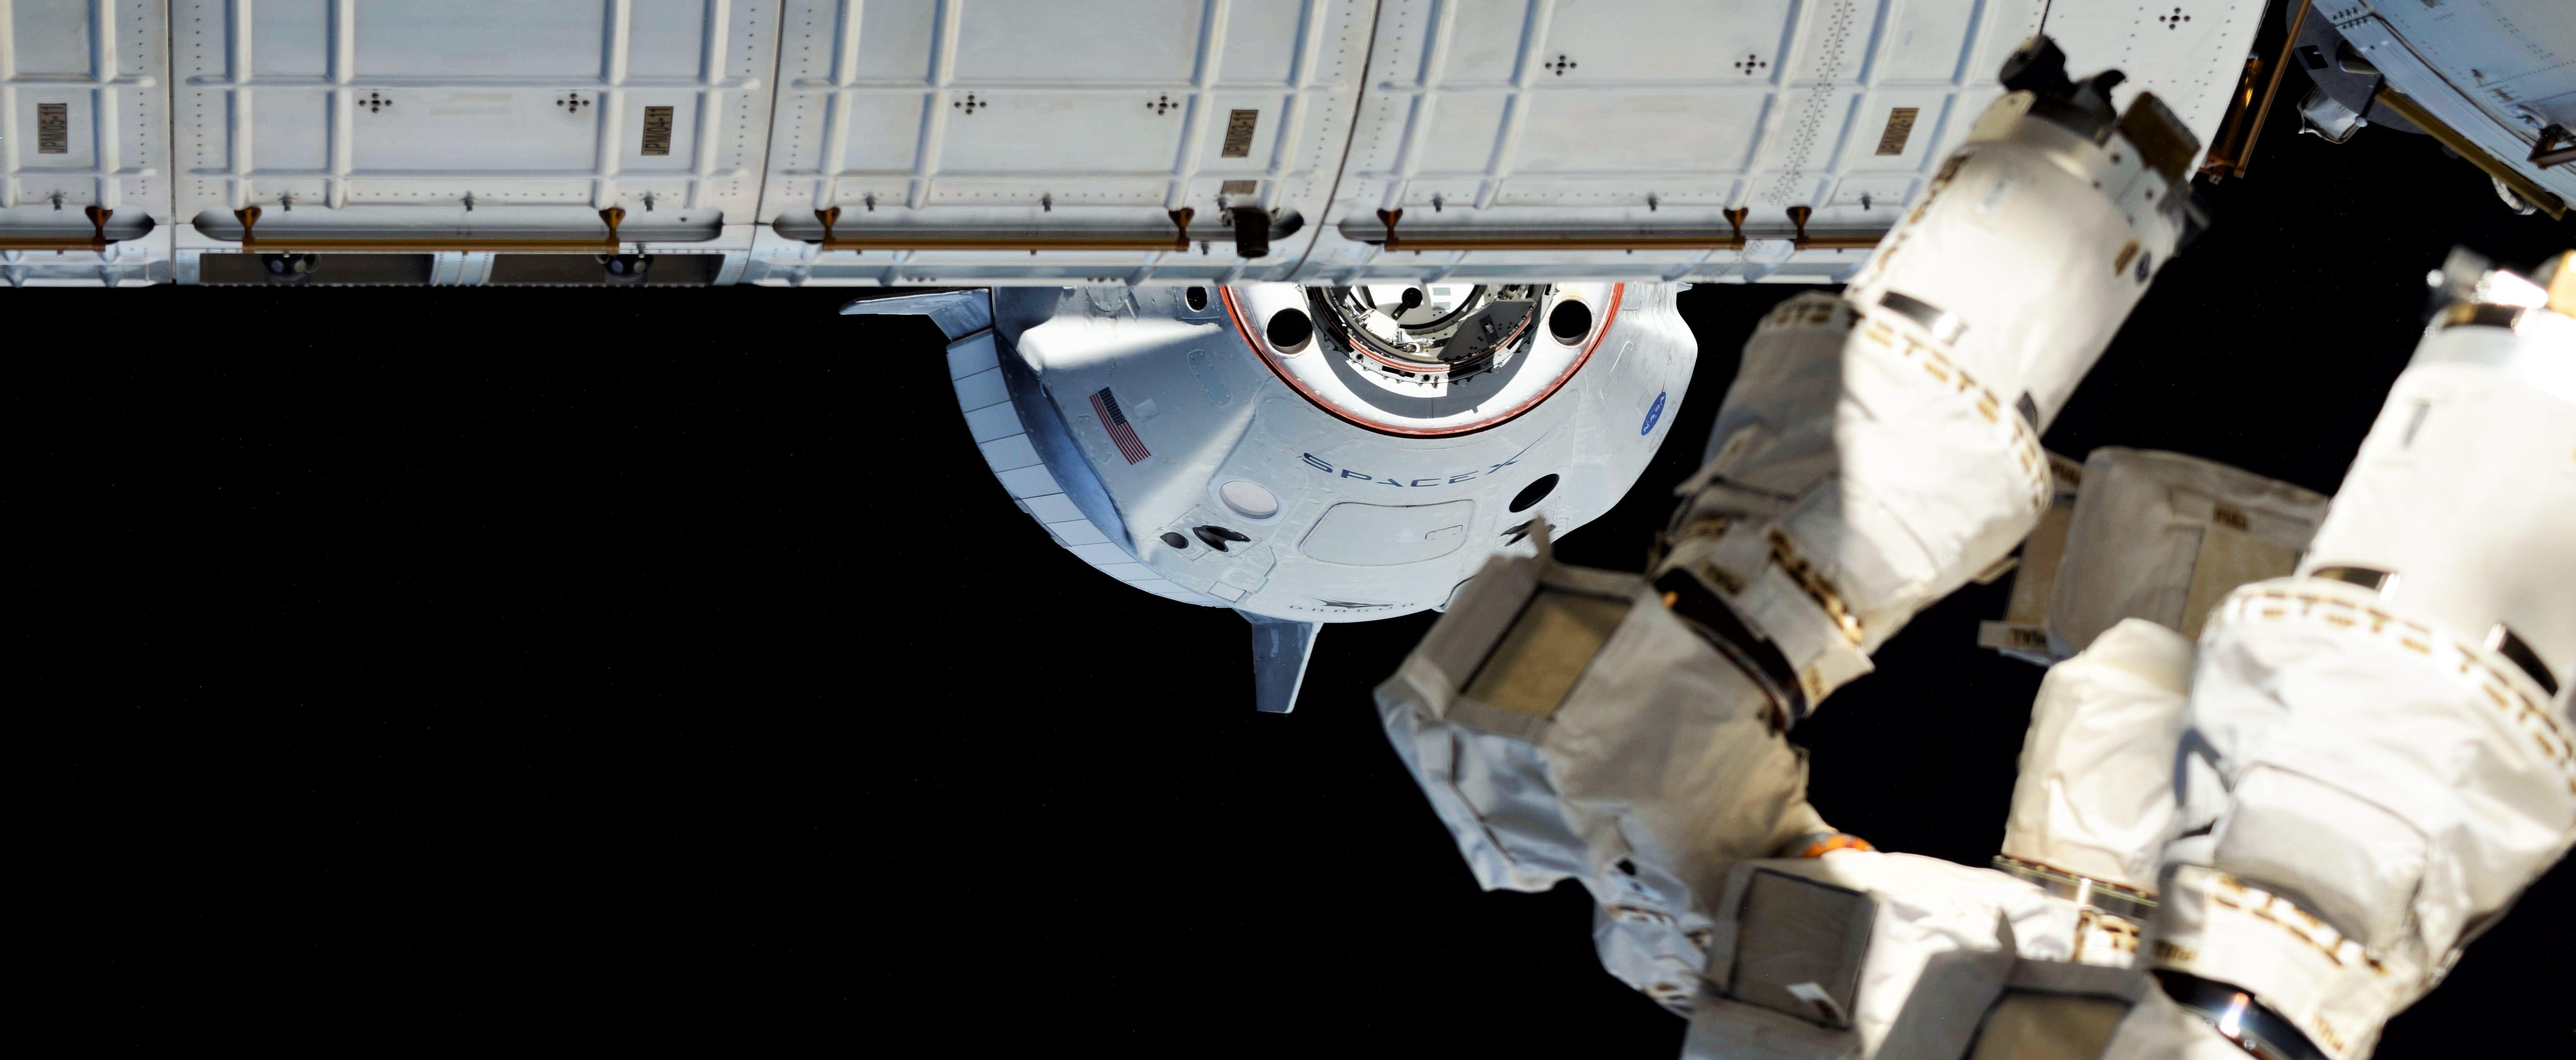 Crew Dragon DM-1 ISS arrival 030319 (Oleg Kononenko) 3 crop (c)